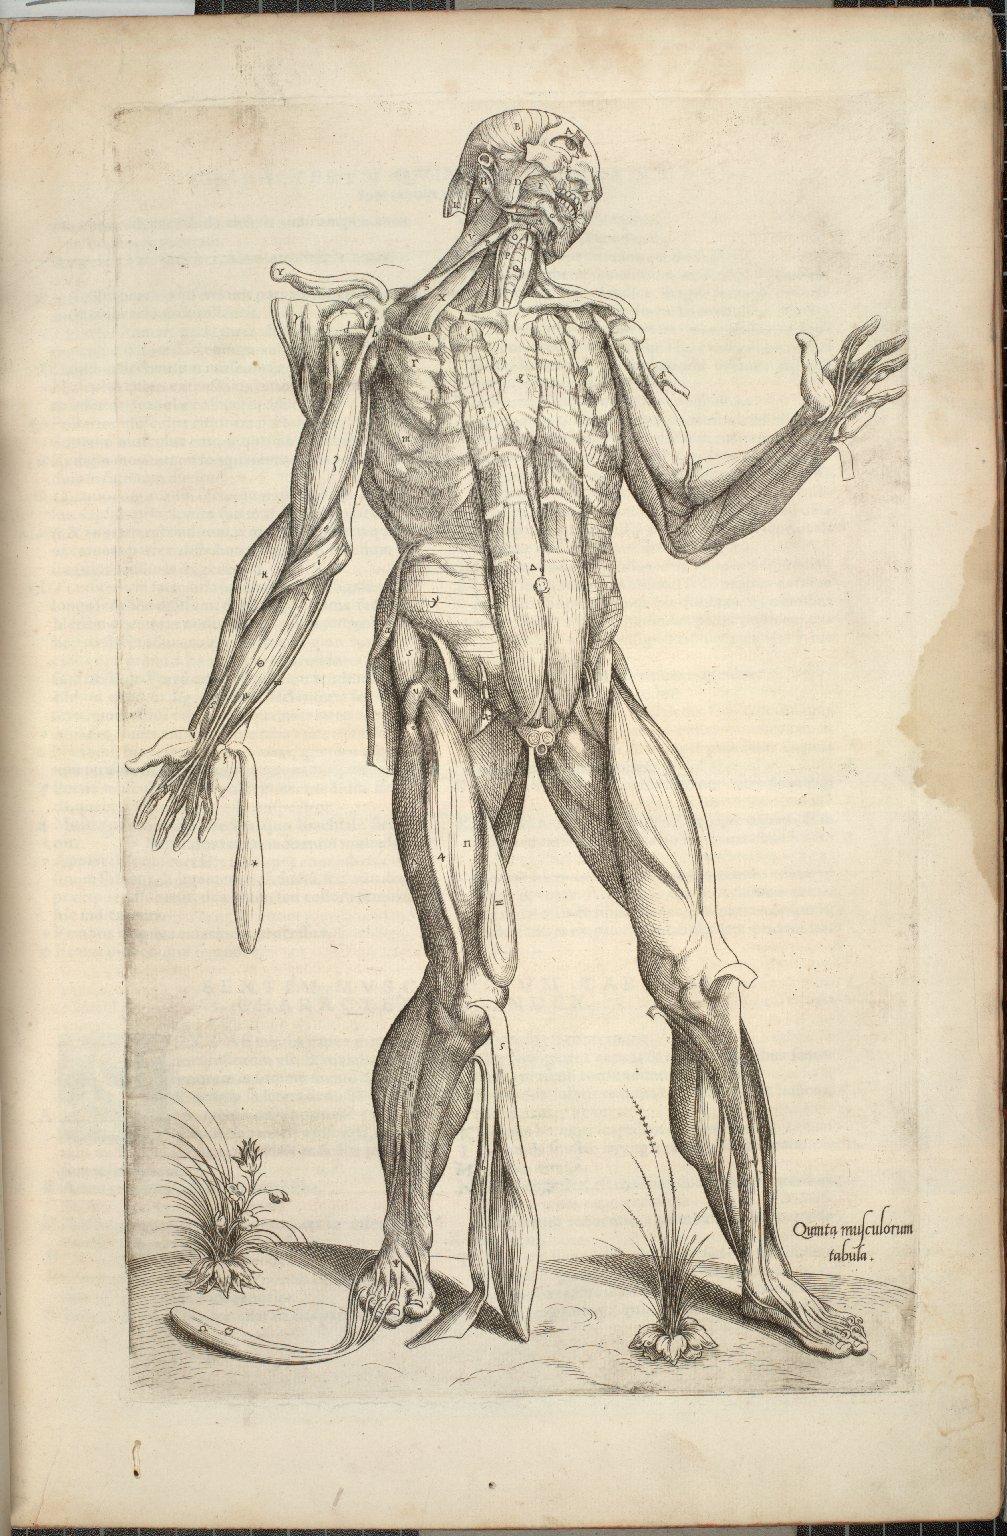 Quinta Musculorum Tabula